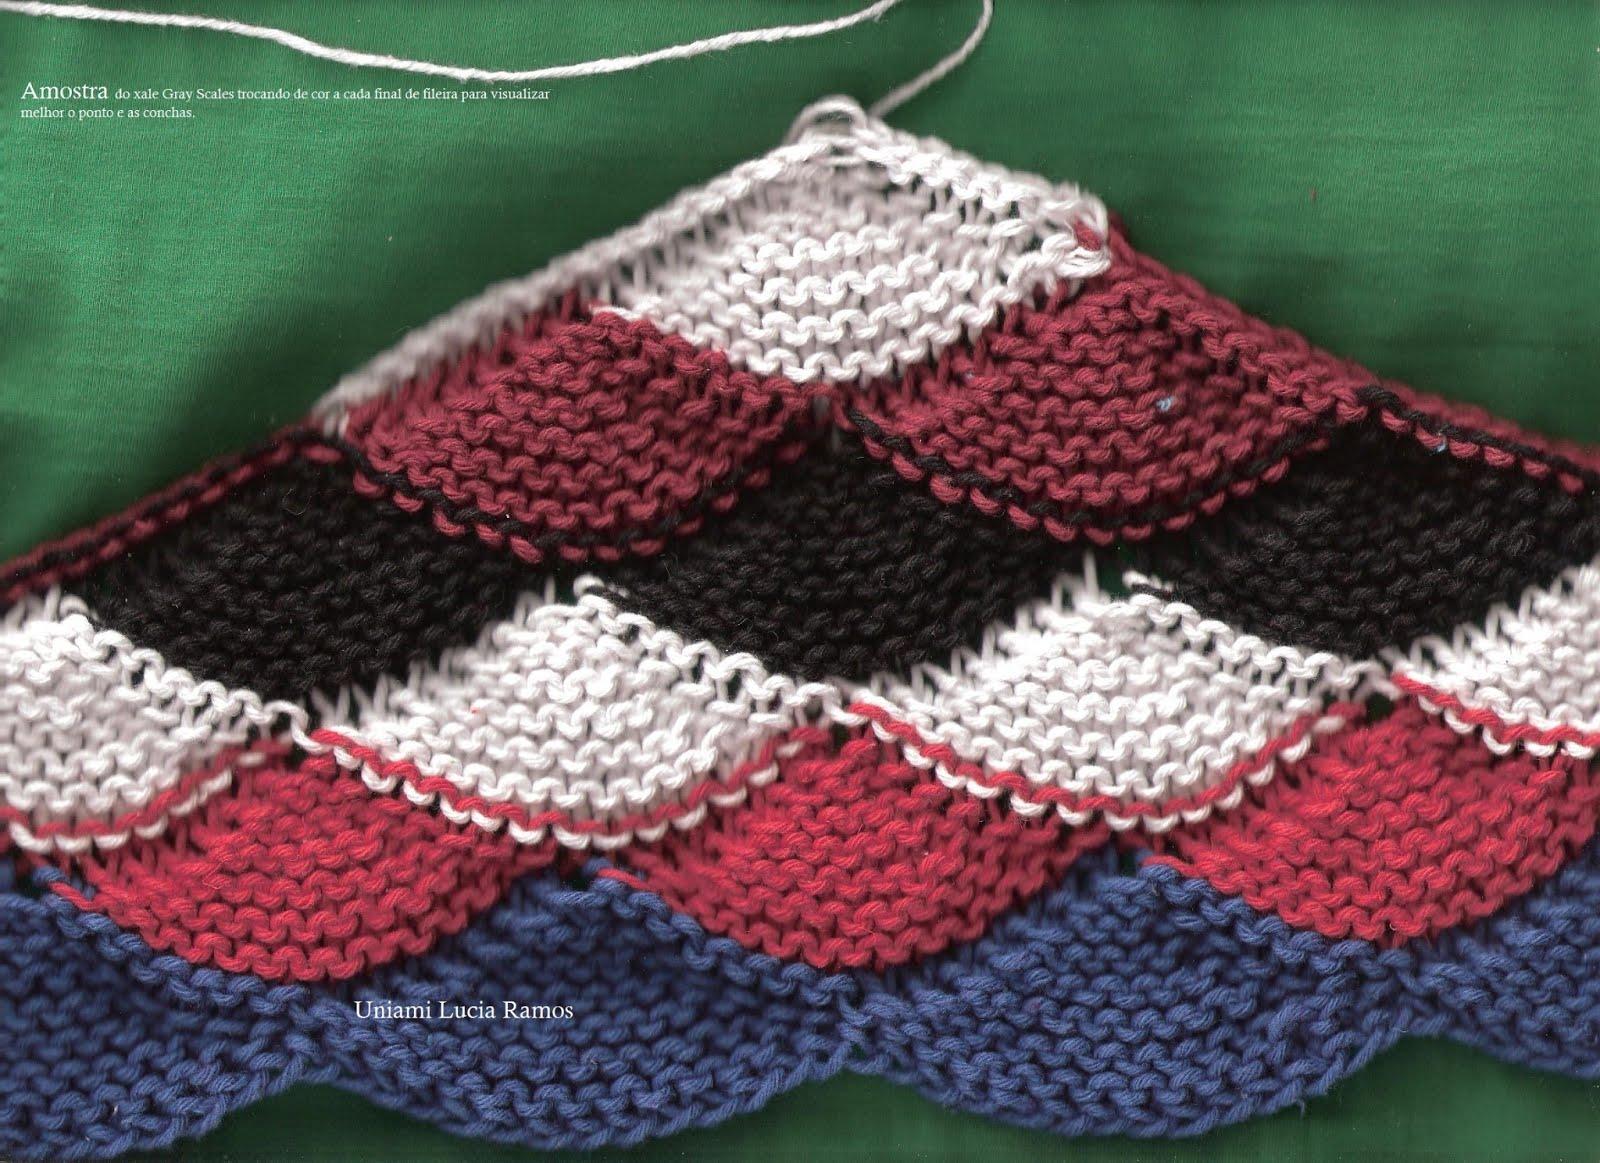 Uniami crochet faa uma miniatura do xale fandeluxe Image collections